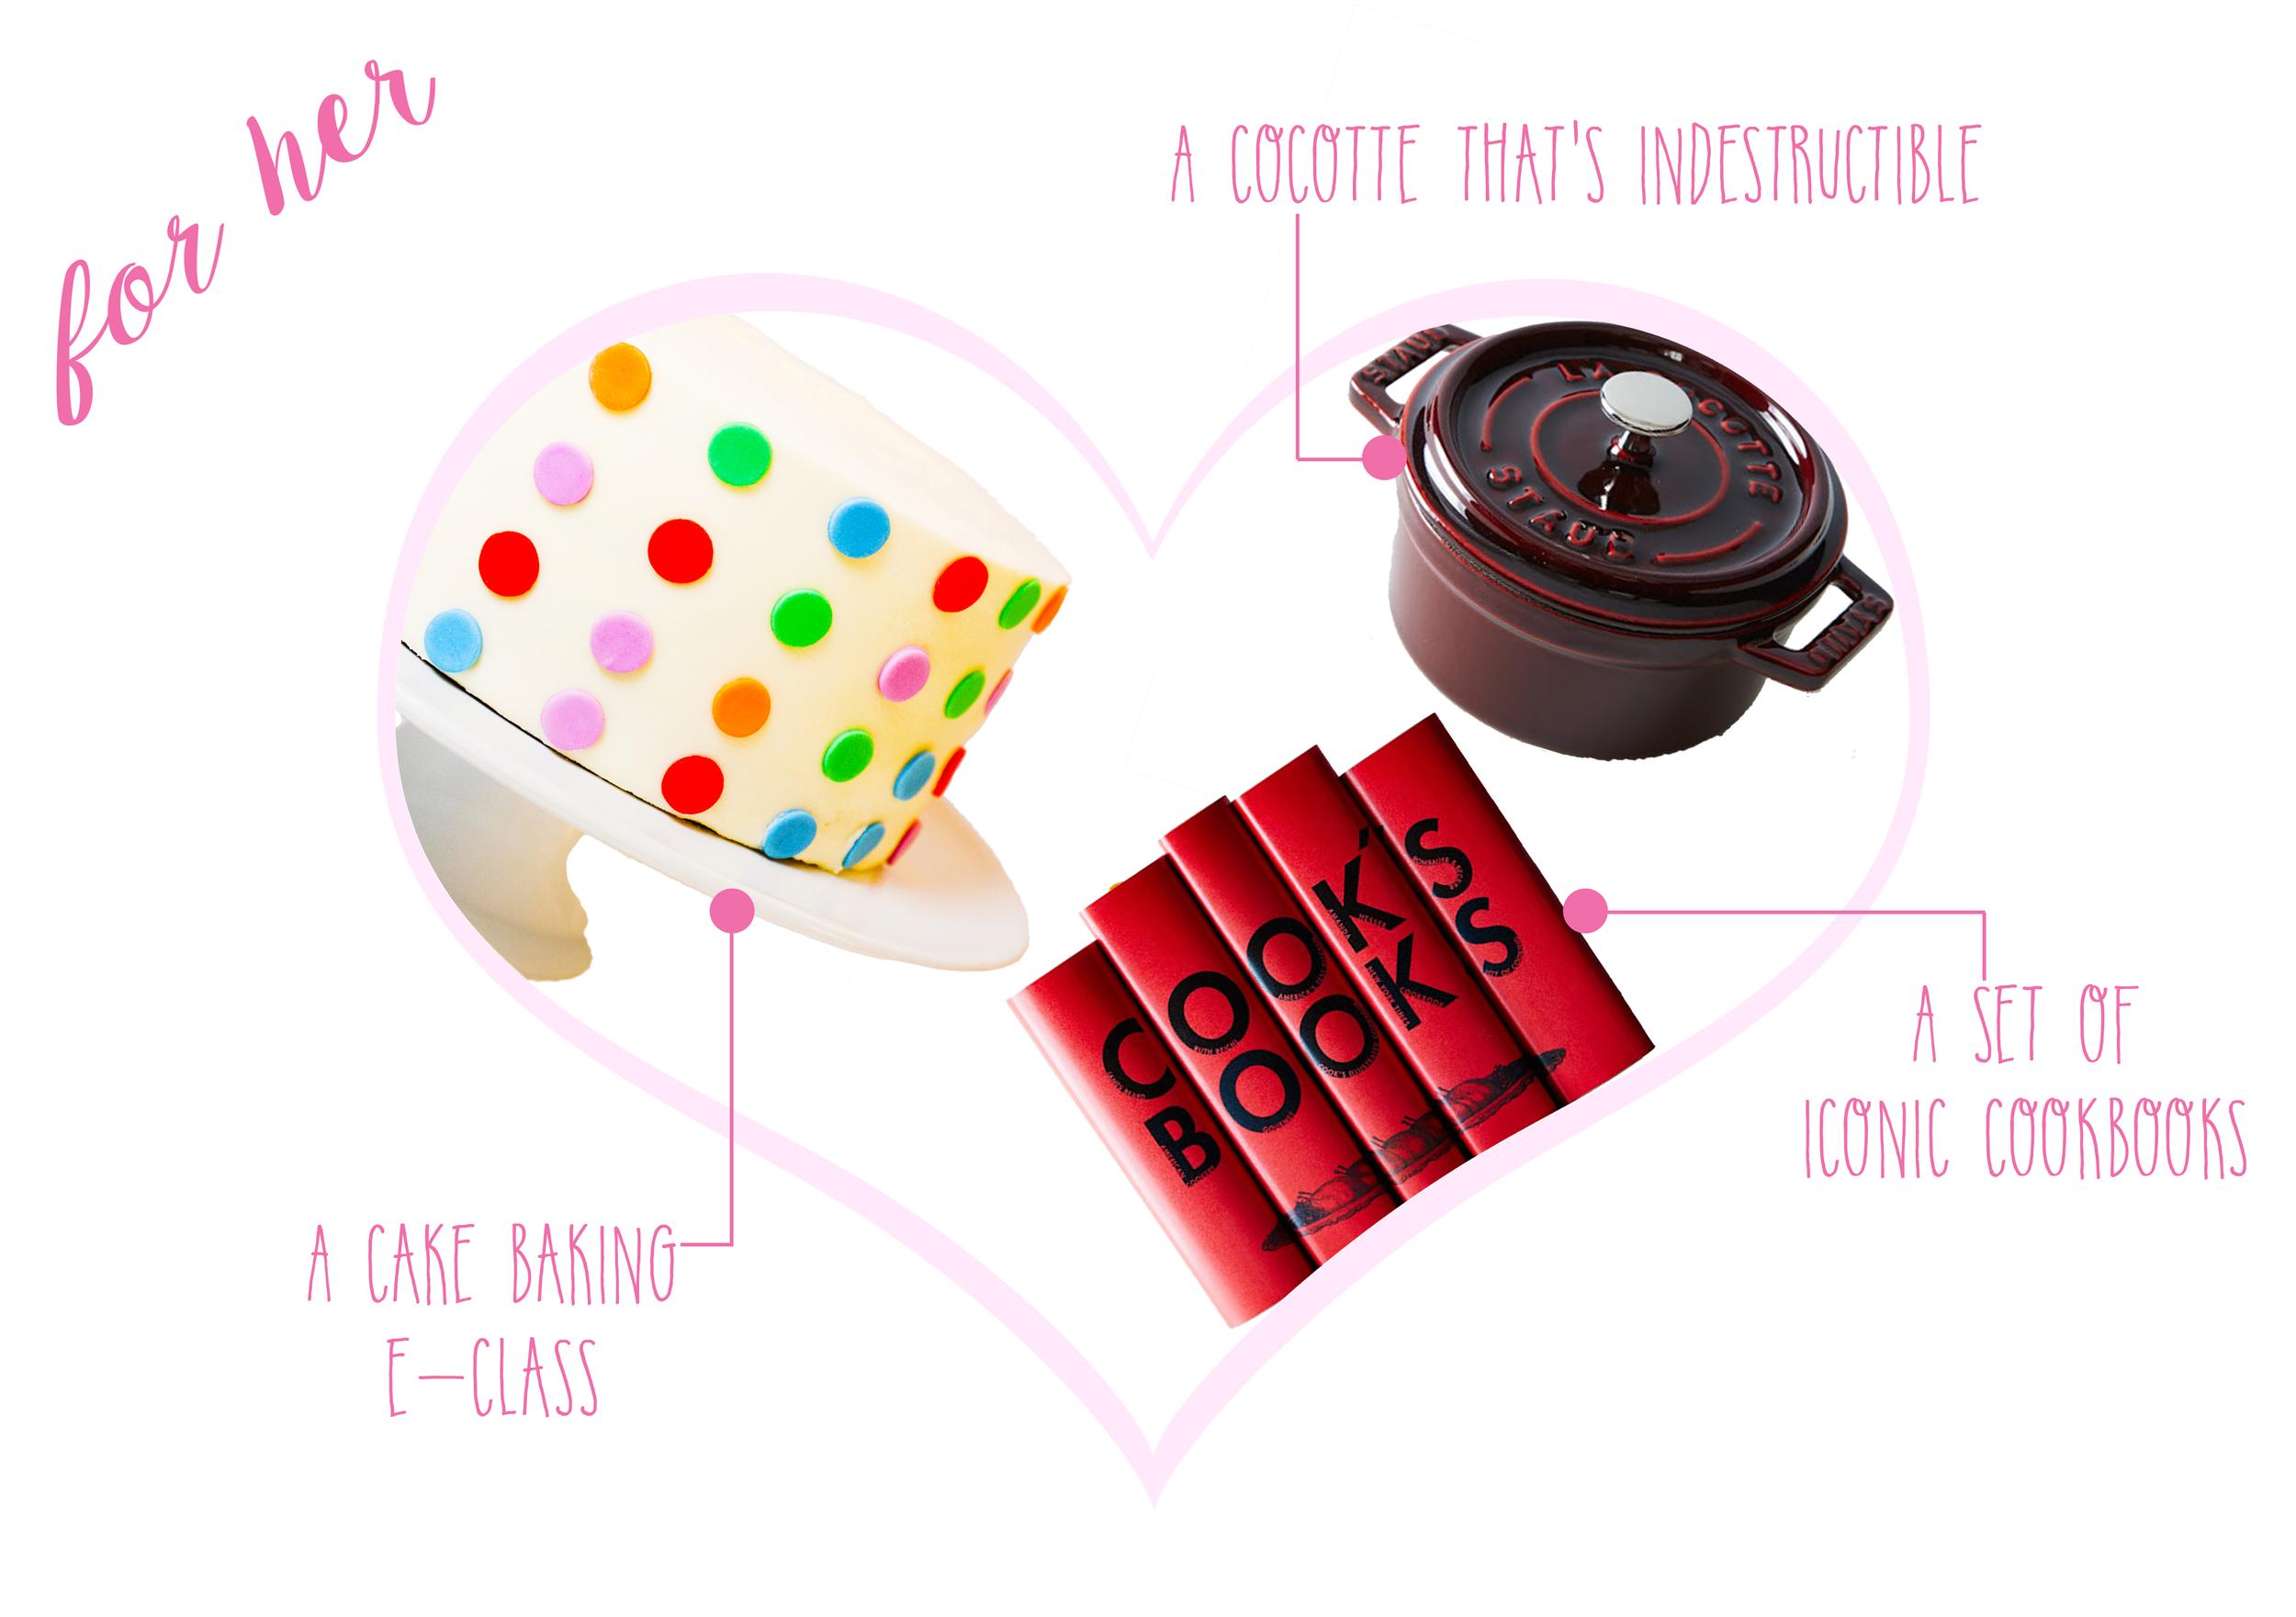 Cake Baking e-Class  &  Baking Kit  ($20 & $95) -  Iconic Cook Book set  ($295) -  Staub Mini Cocotte  ($185)